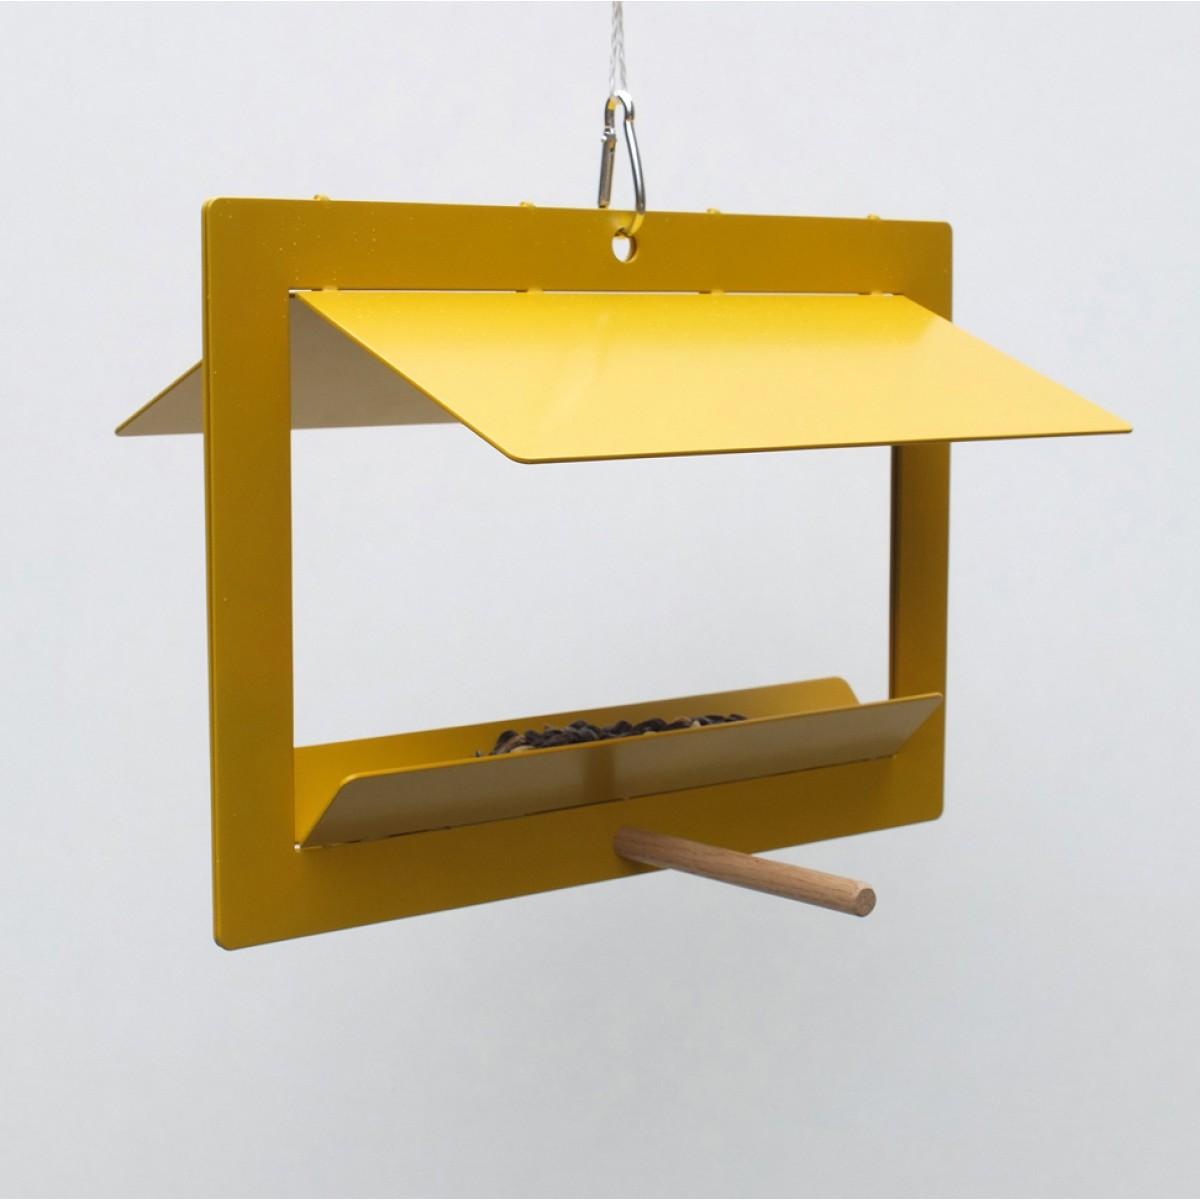 Olaf Riedel Vogelhaus - birdhouse DIN A4/natur